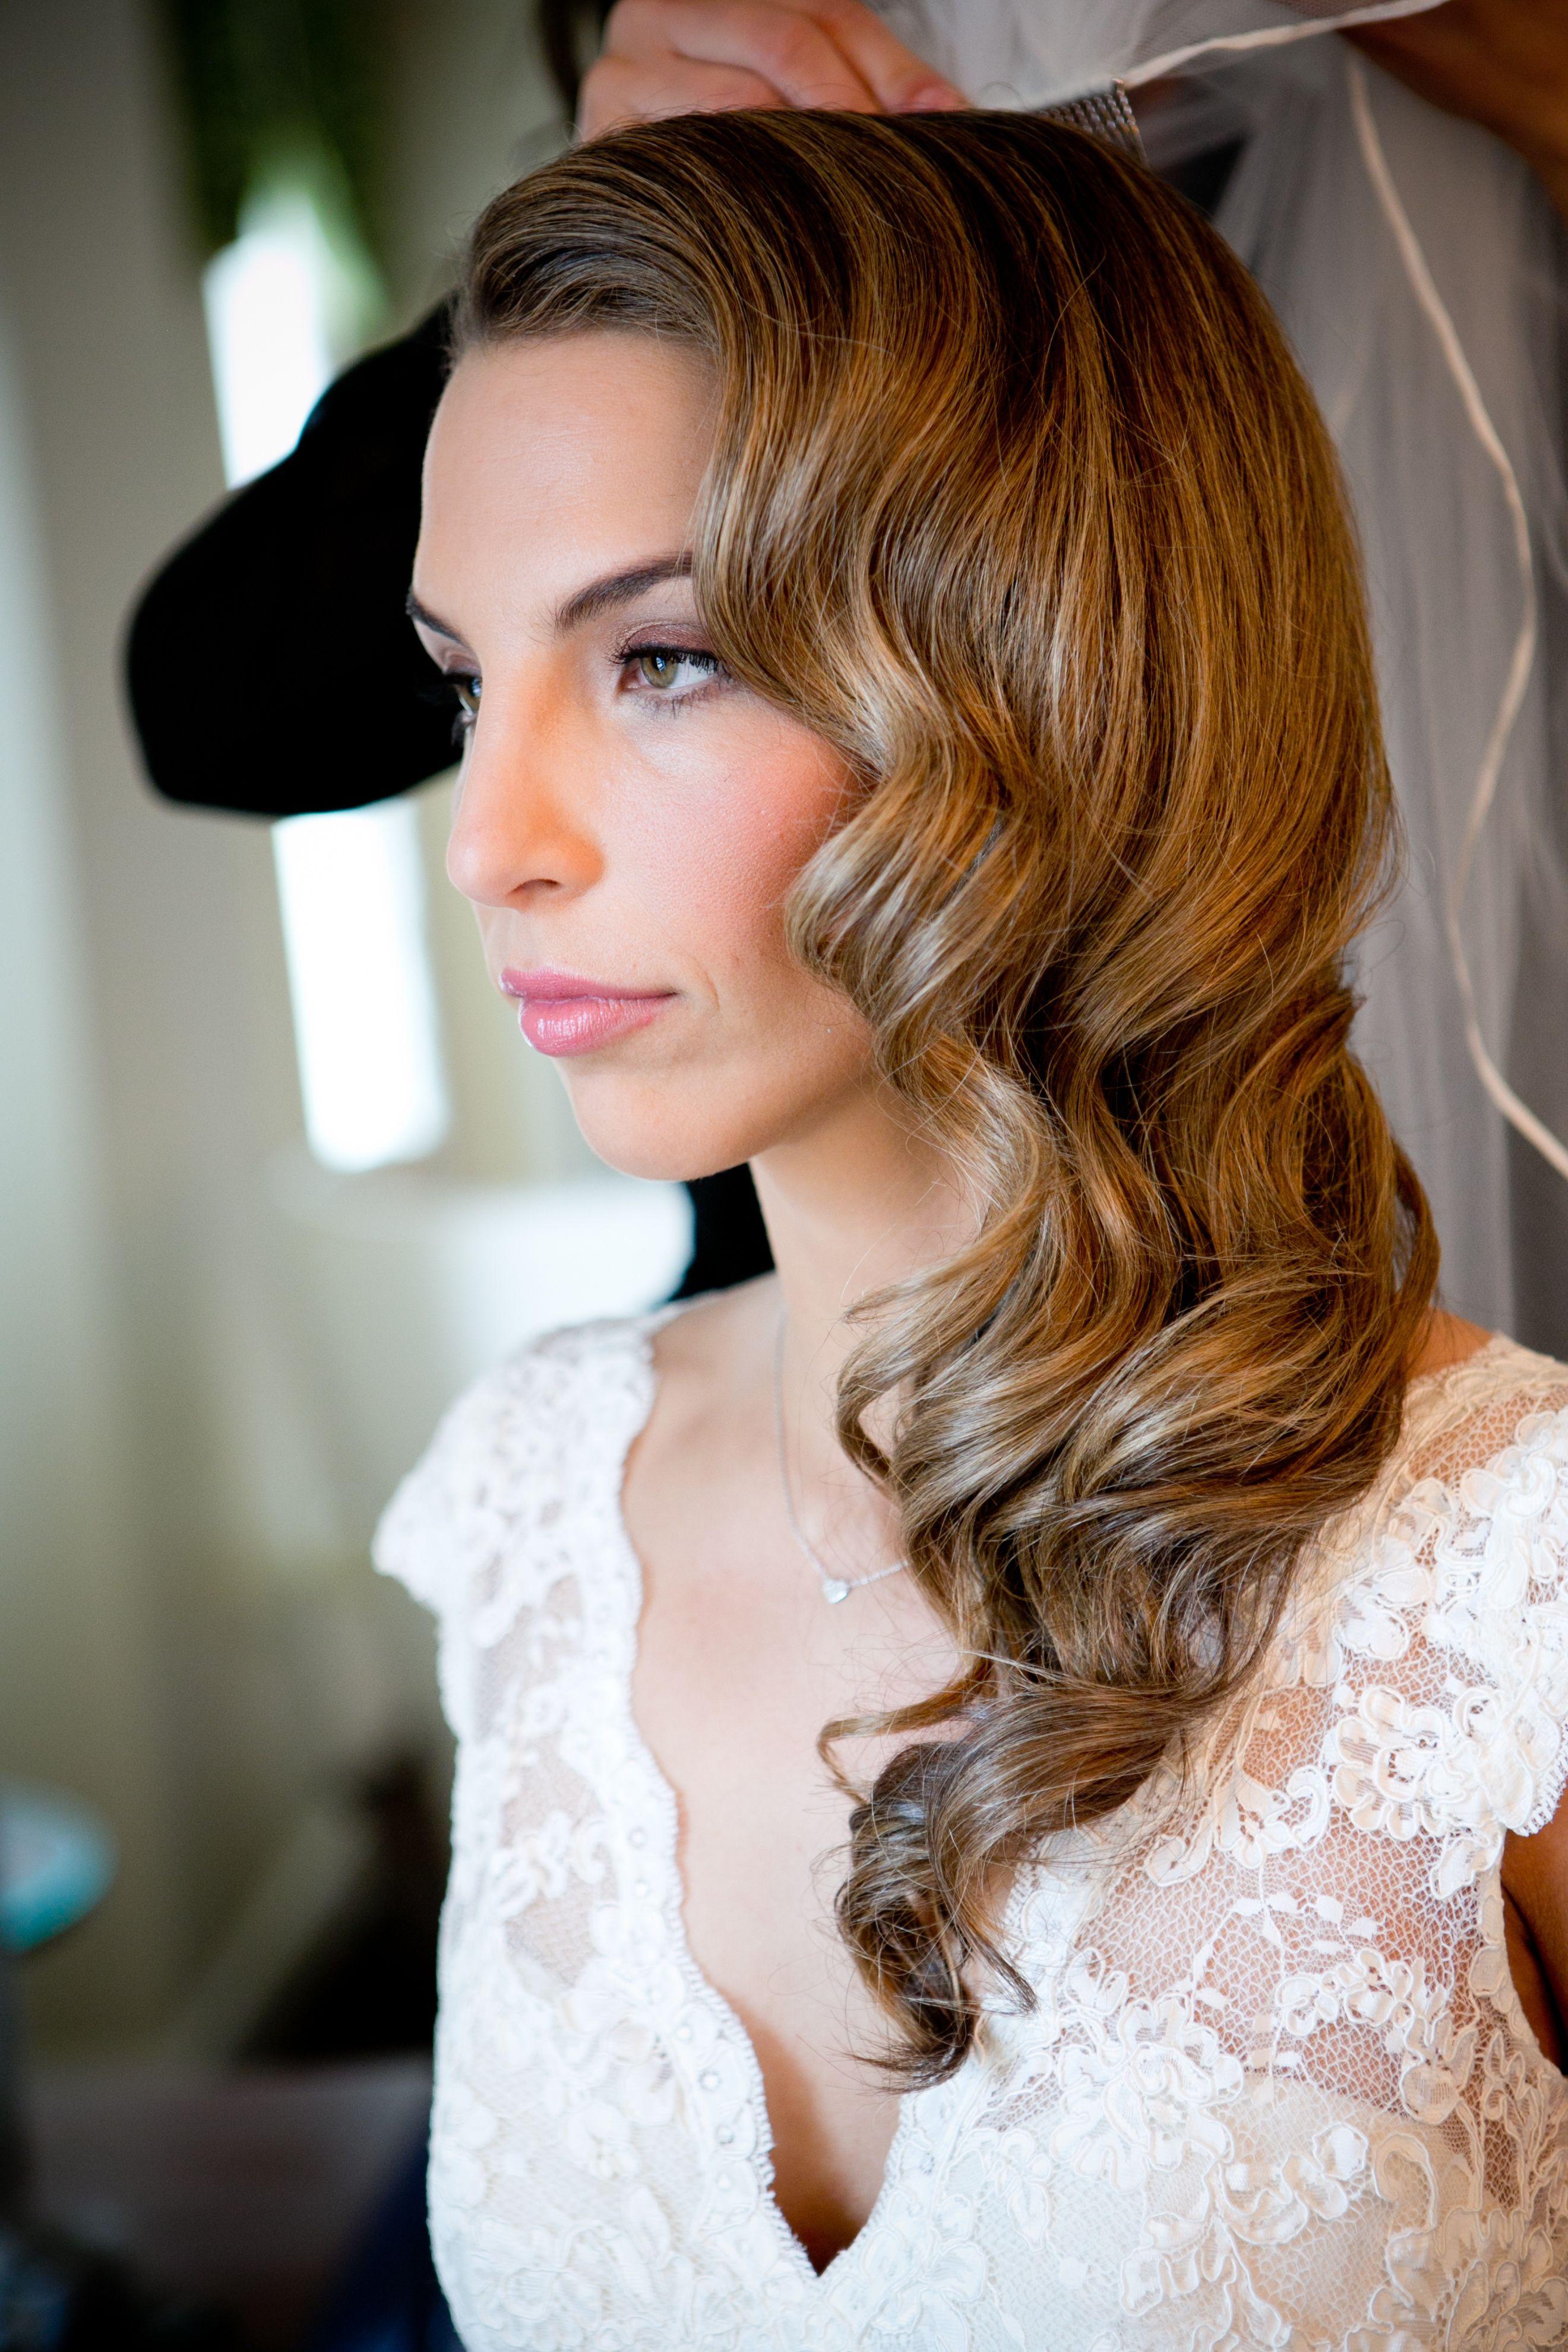 www.gbhair.com - Giampaolo & Brunella parrucchieri. Scopri il negozio di vendita online - Beauty, Real Weddings, Wedding Style, Makeup, Down, Wavy Hair, Spring Weddings, City Real Weddings, Classic Real Weddings, Midwest Real Wedd...